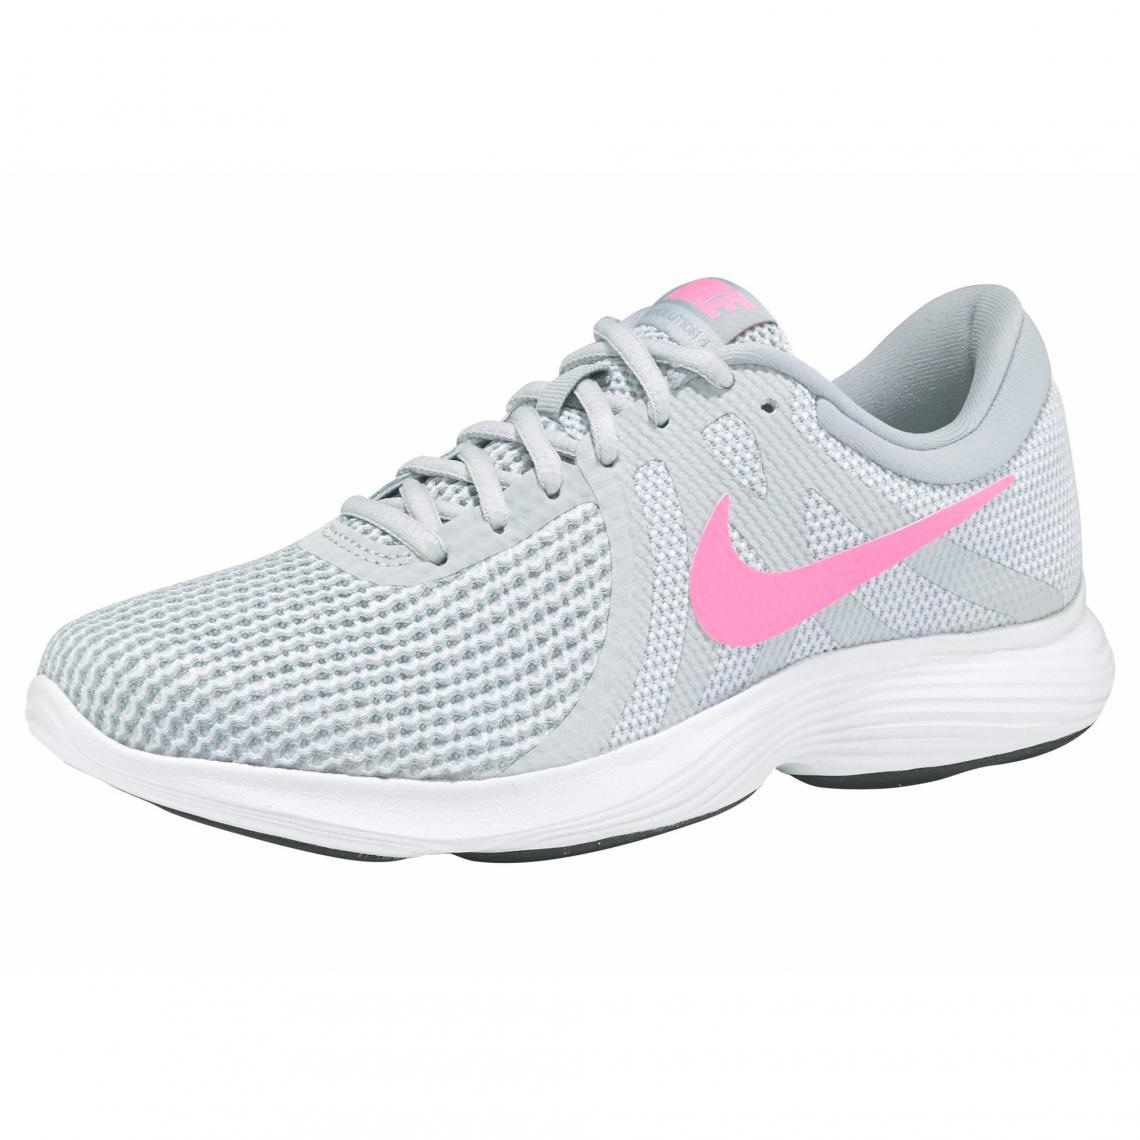 67917a52664f Sneaker femme Nike Revolution 4 - gris clair   corail Nike Femme